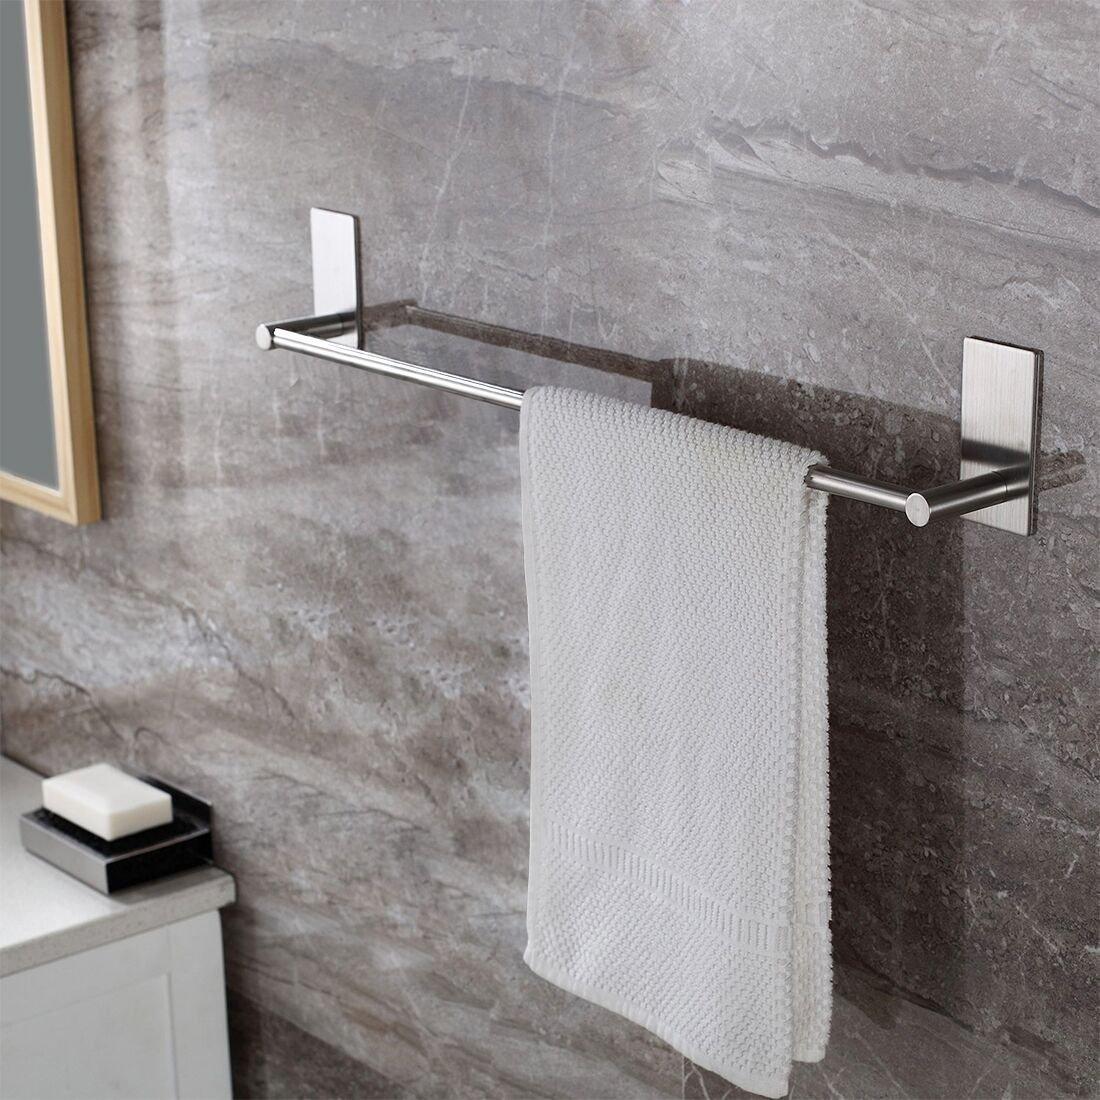 weare Home Brushed superficie silbern Fá cil Modern individualmente mano –  Toallero (pegar para cuarto de bañ o ducha cocina de alta calidad acero inoxidable sin agujeros, acero, plateado, L40cm